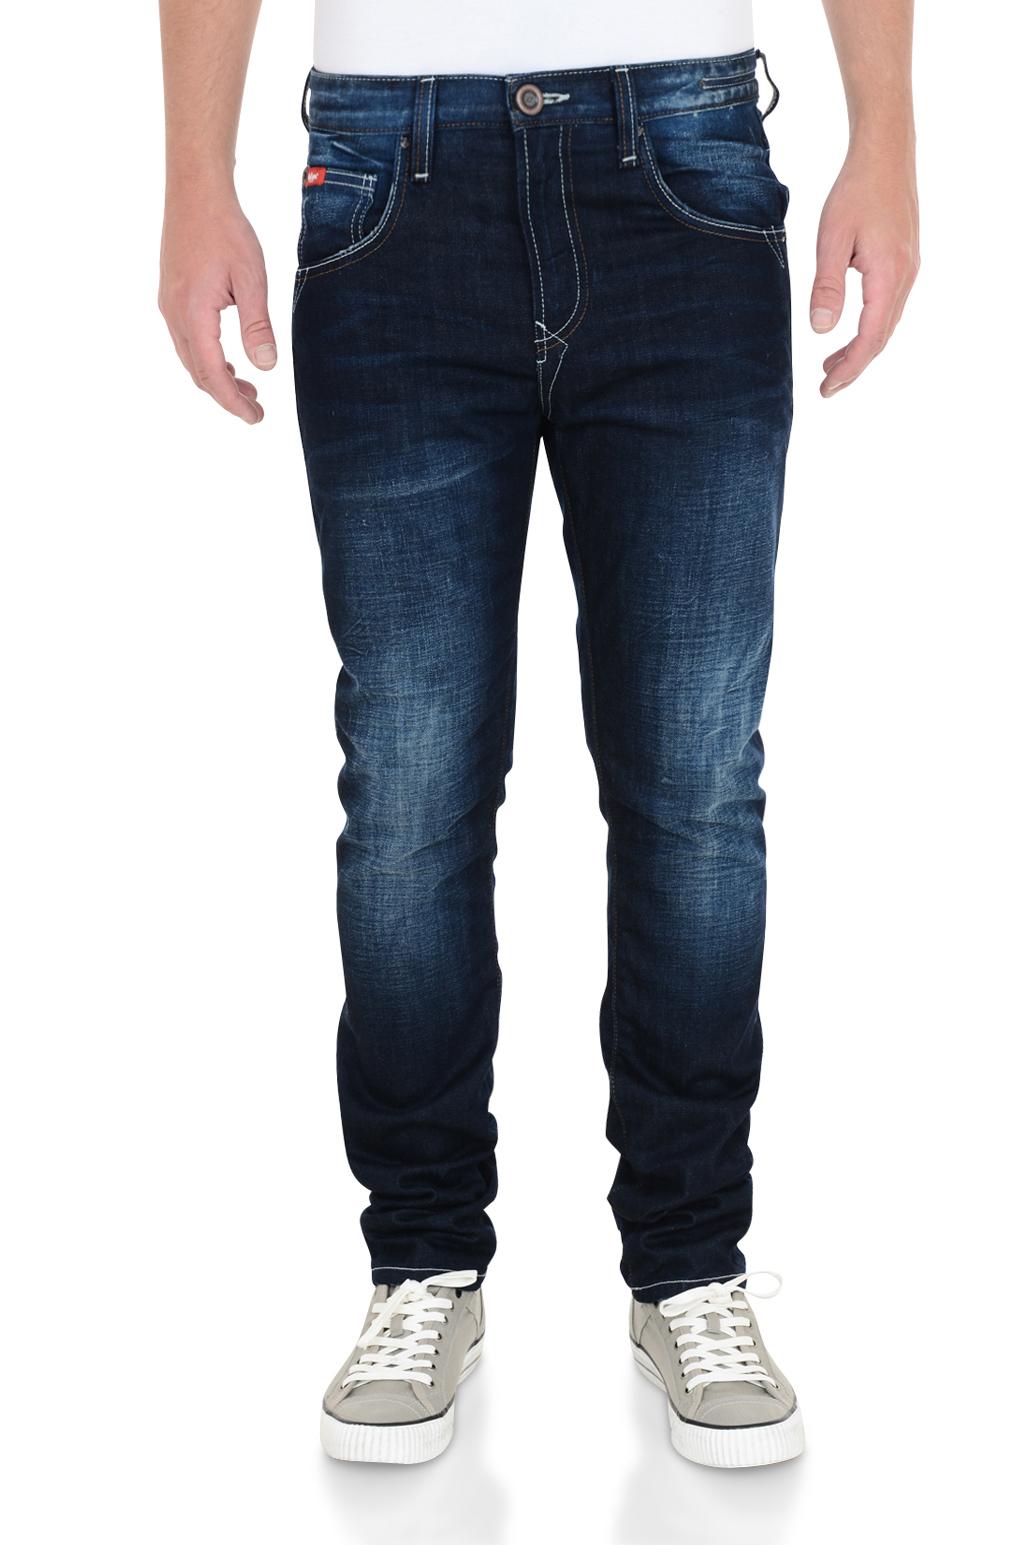 Click on the Image to Enlarge. More Details. Lee Cooper Norris Slim Fit  men's Mid Wash jeans.